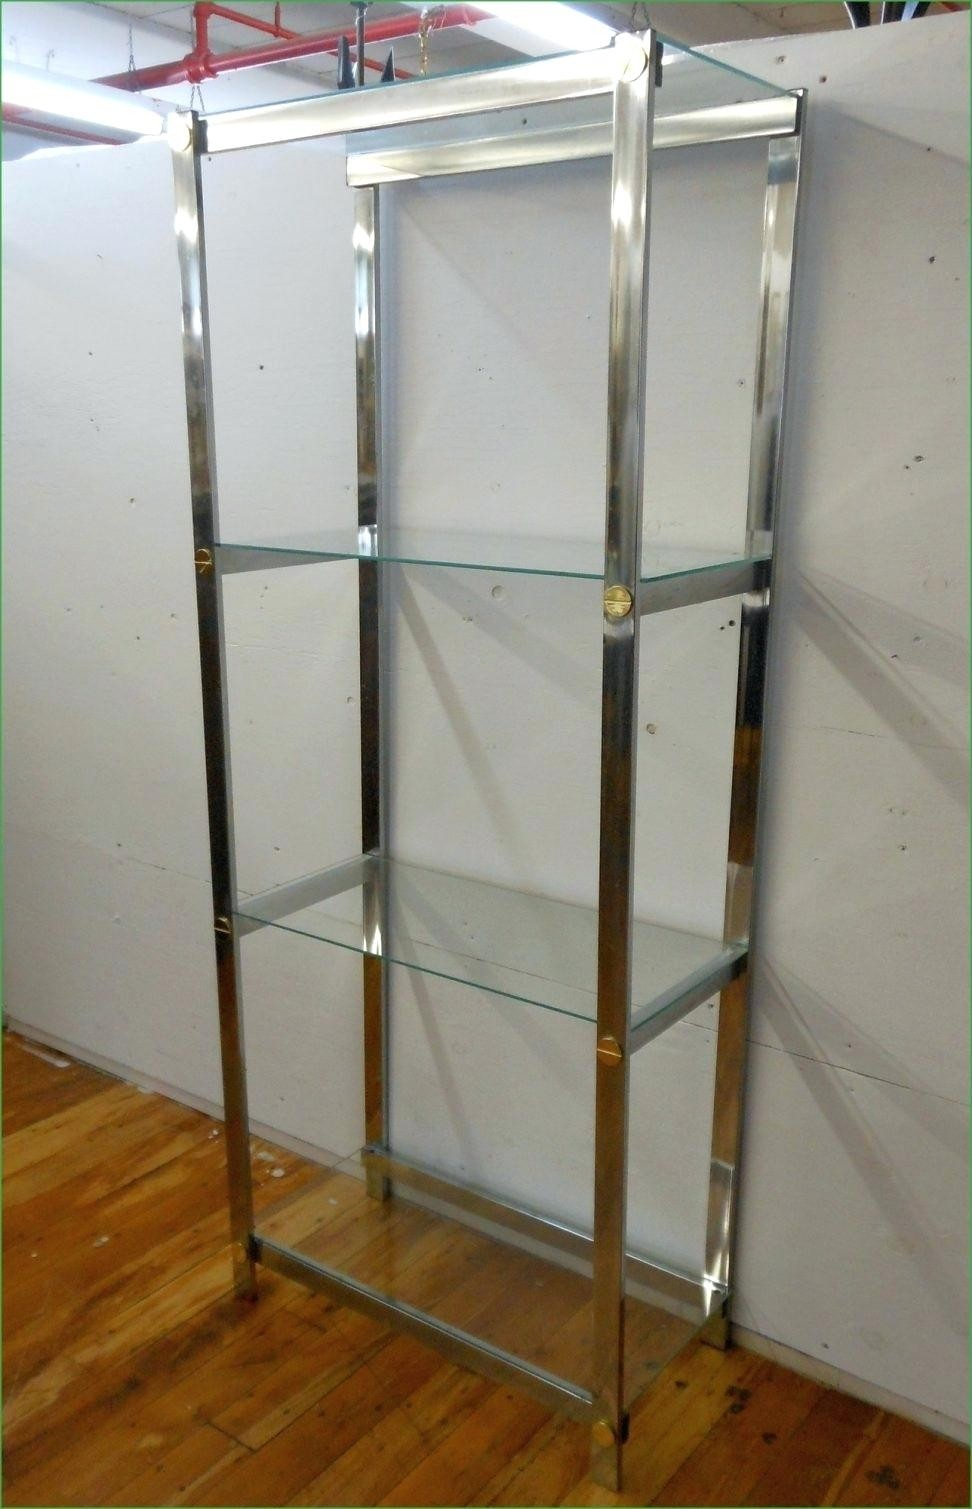 Chrome Bookcases Foter Rh Com Gl And Shelving Units Floating Shelves